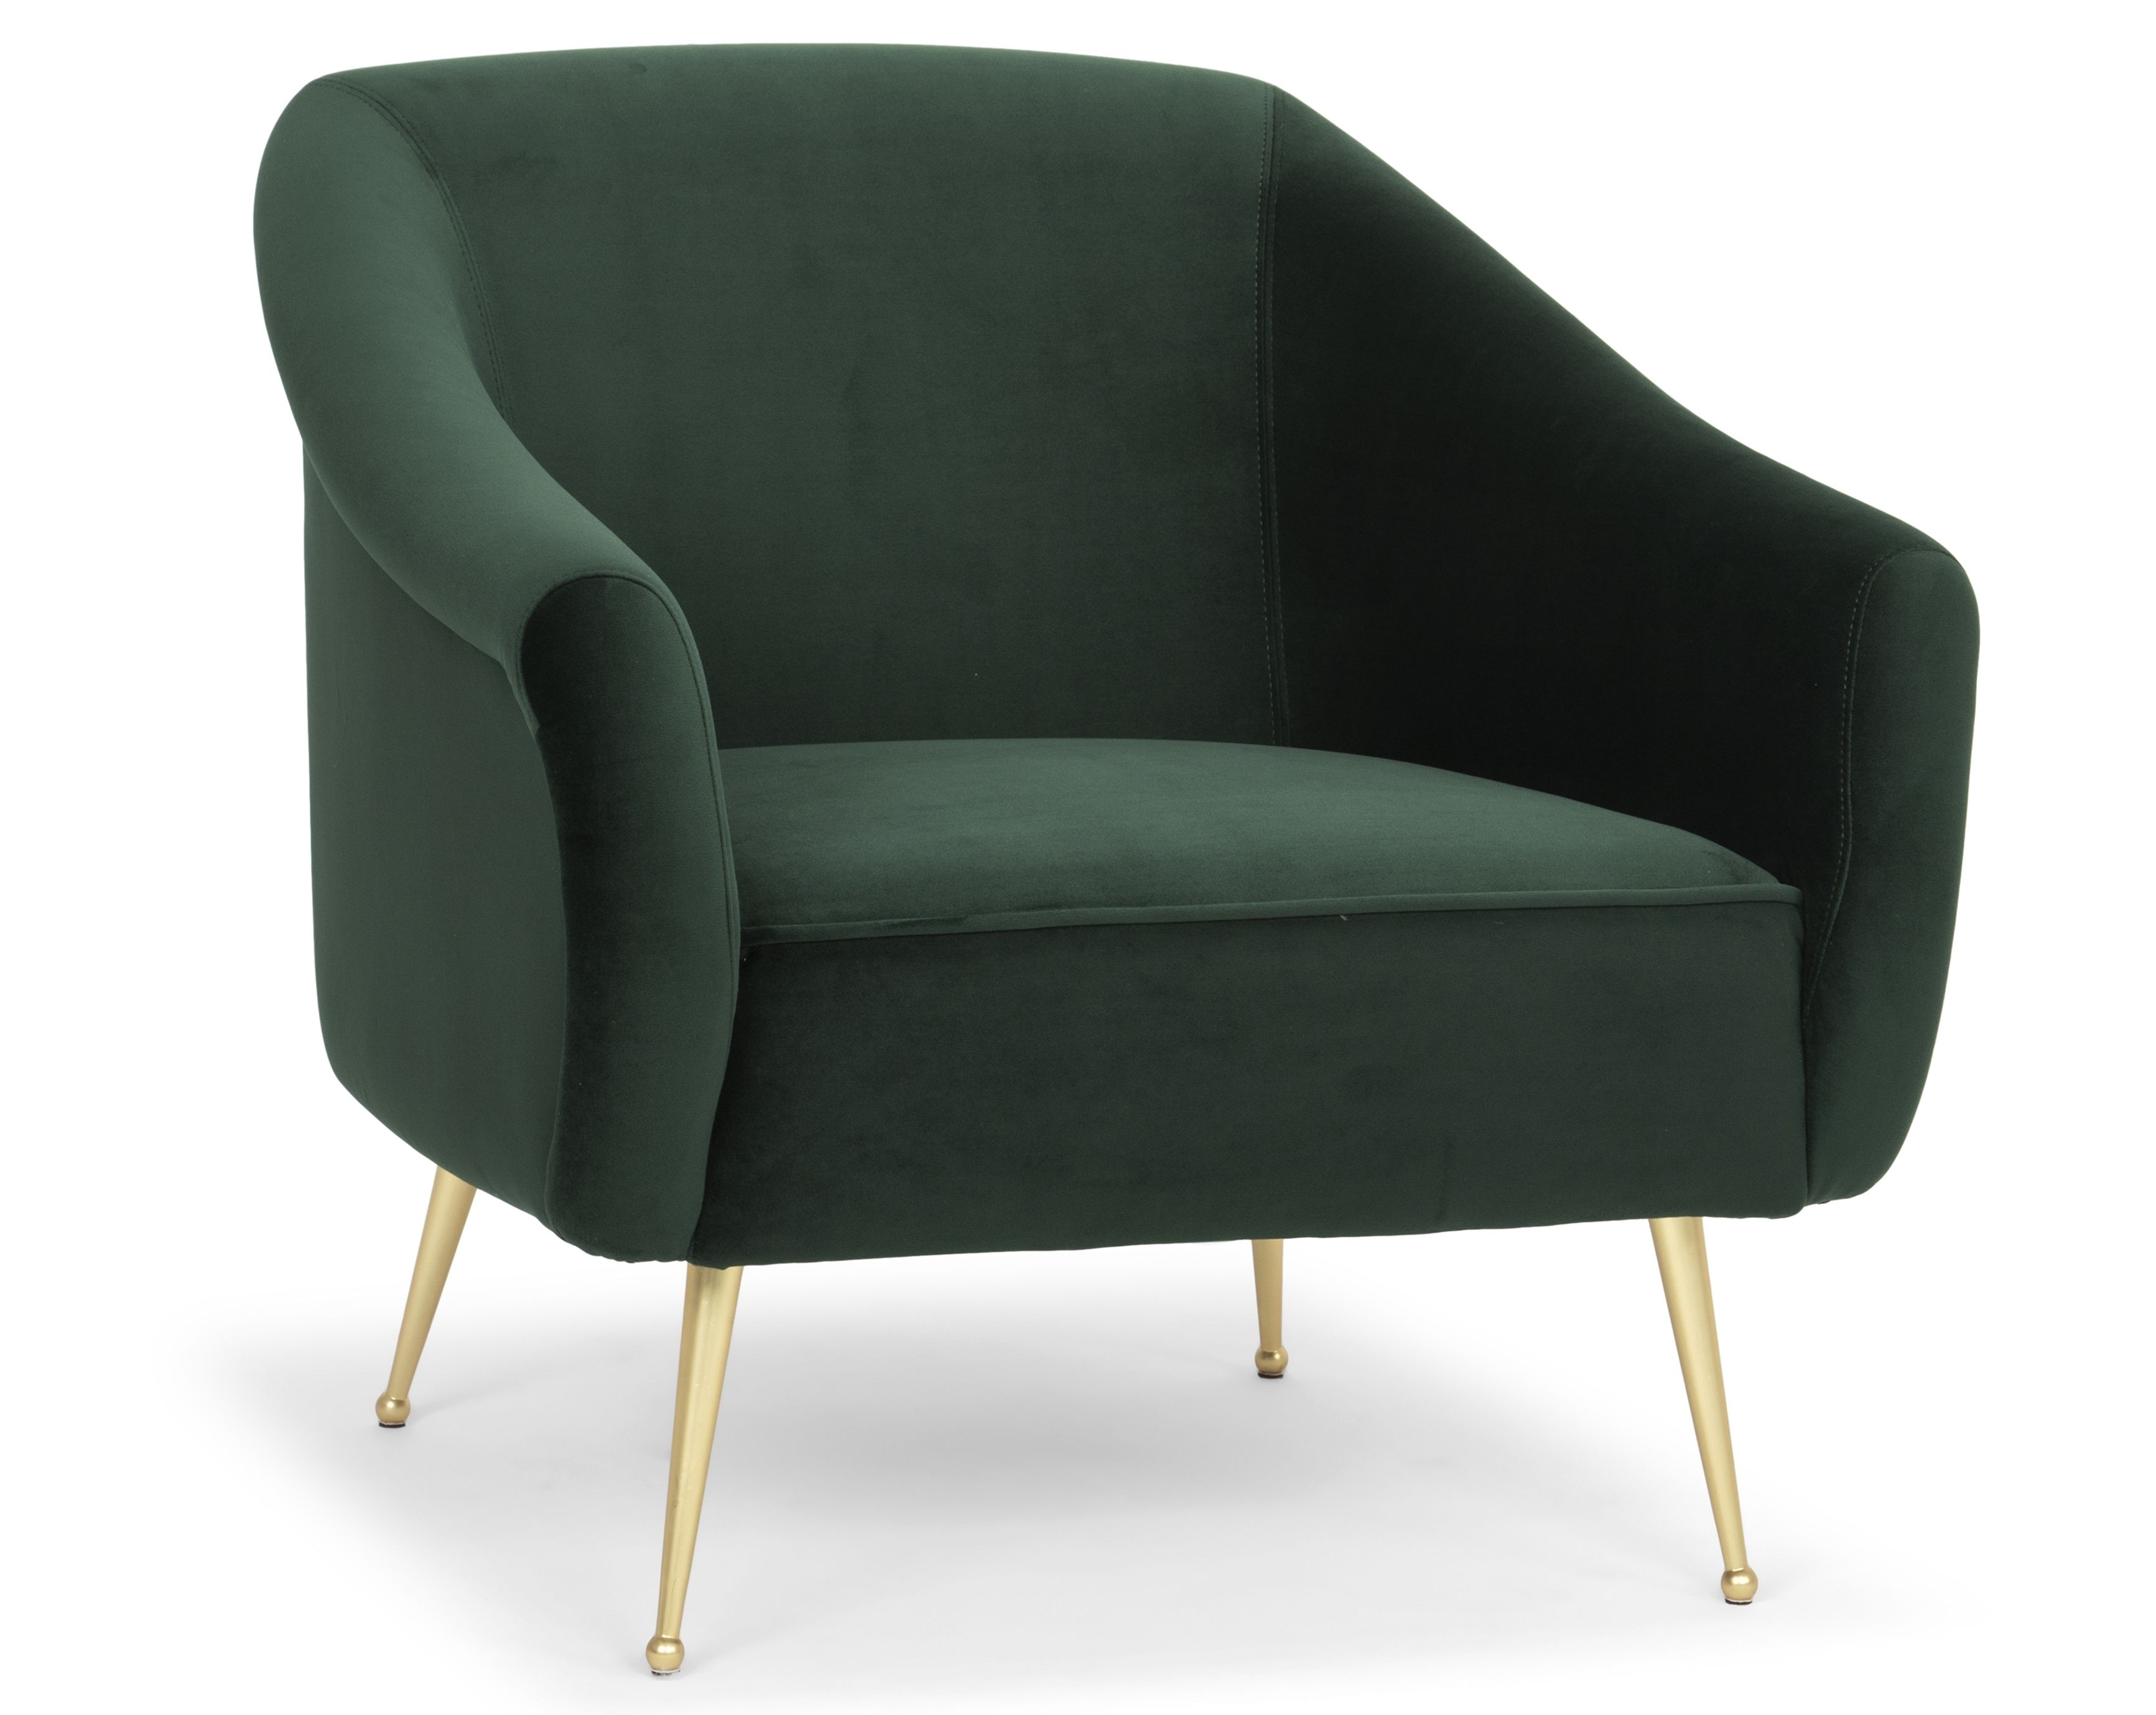 Adele Arm Chair Emerald Green Furnish Armchair Chair